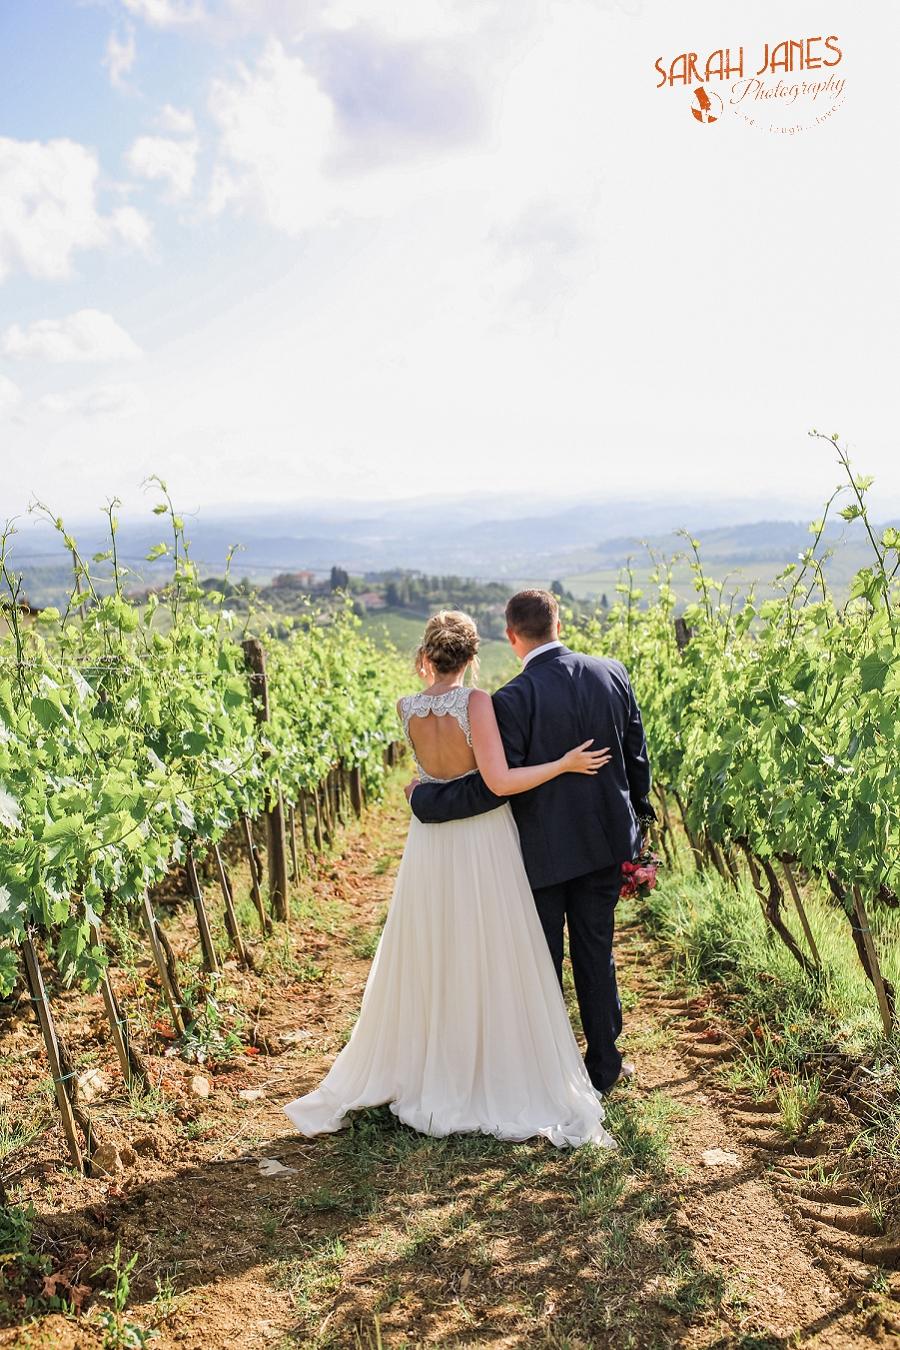 Sarah Janes Photography, Italy wedding photography, wedding photography at Le Fonti delle Meraviglie, UK Destination wedding photography_0068.jpg